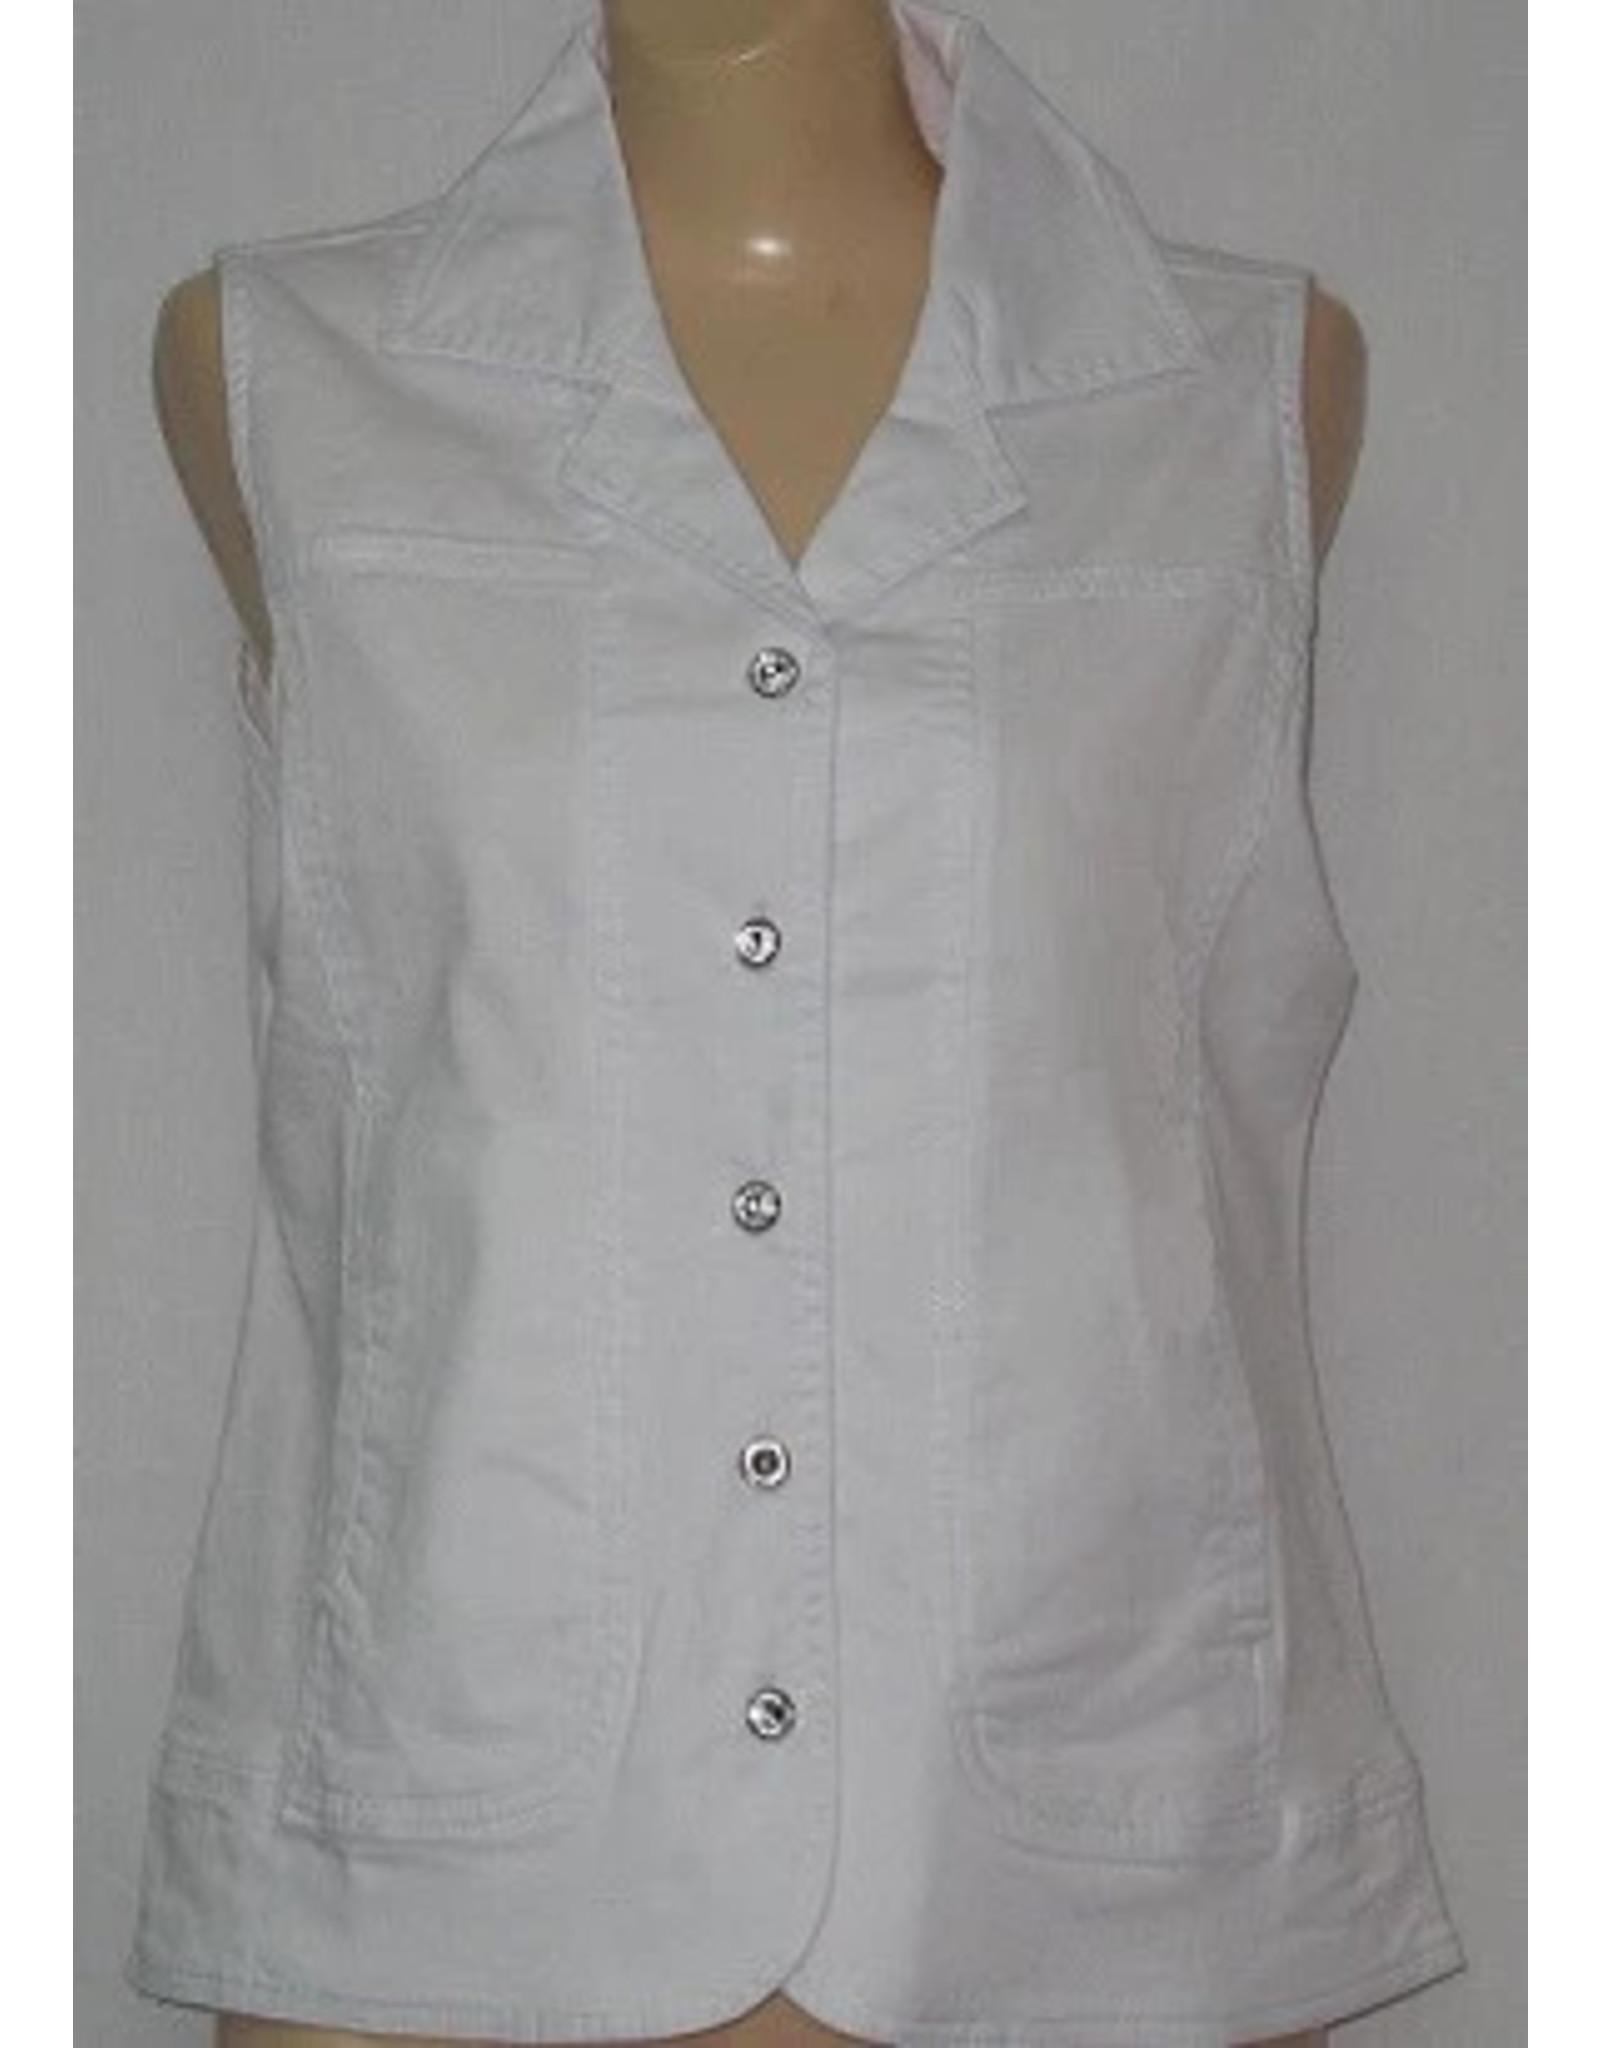 Marcel Stretch Denim Vest with Crystal Buttons